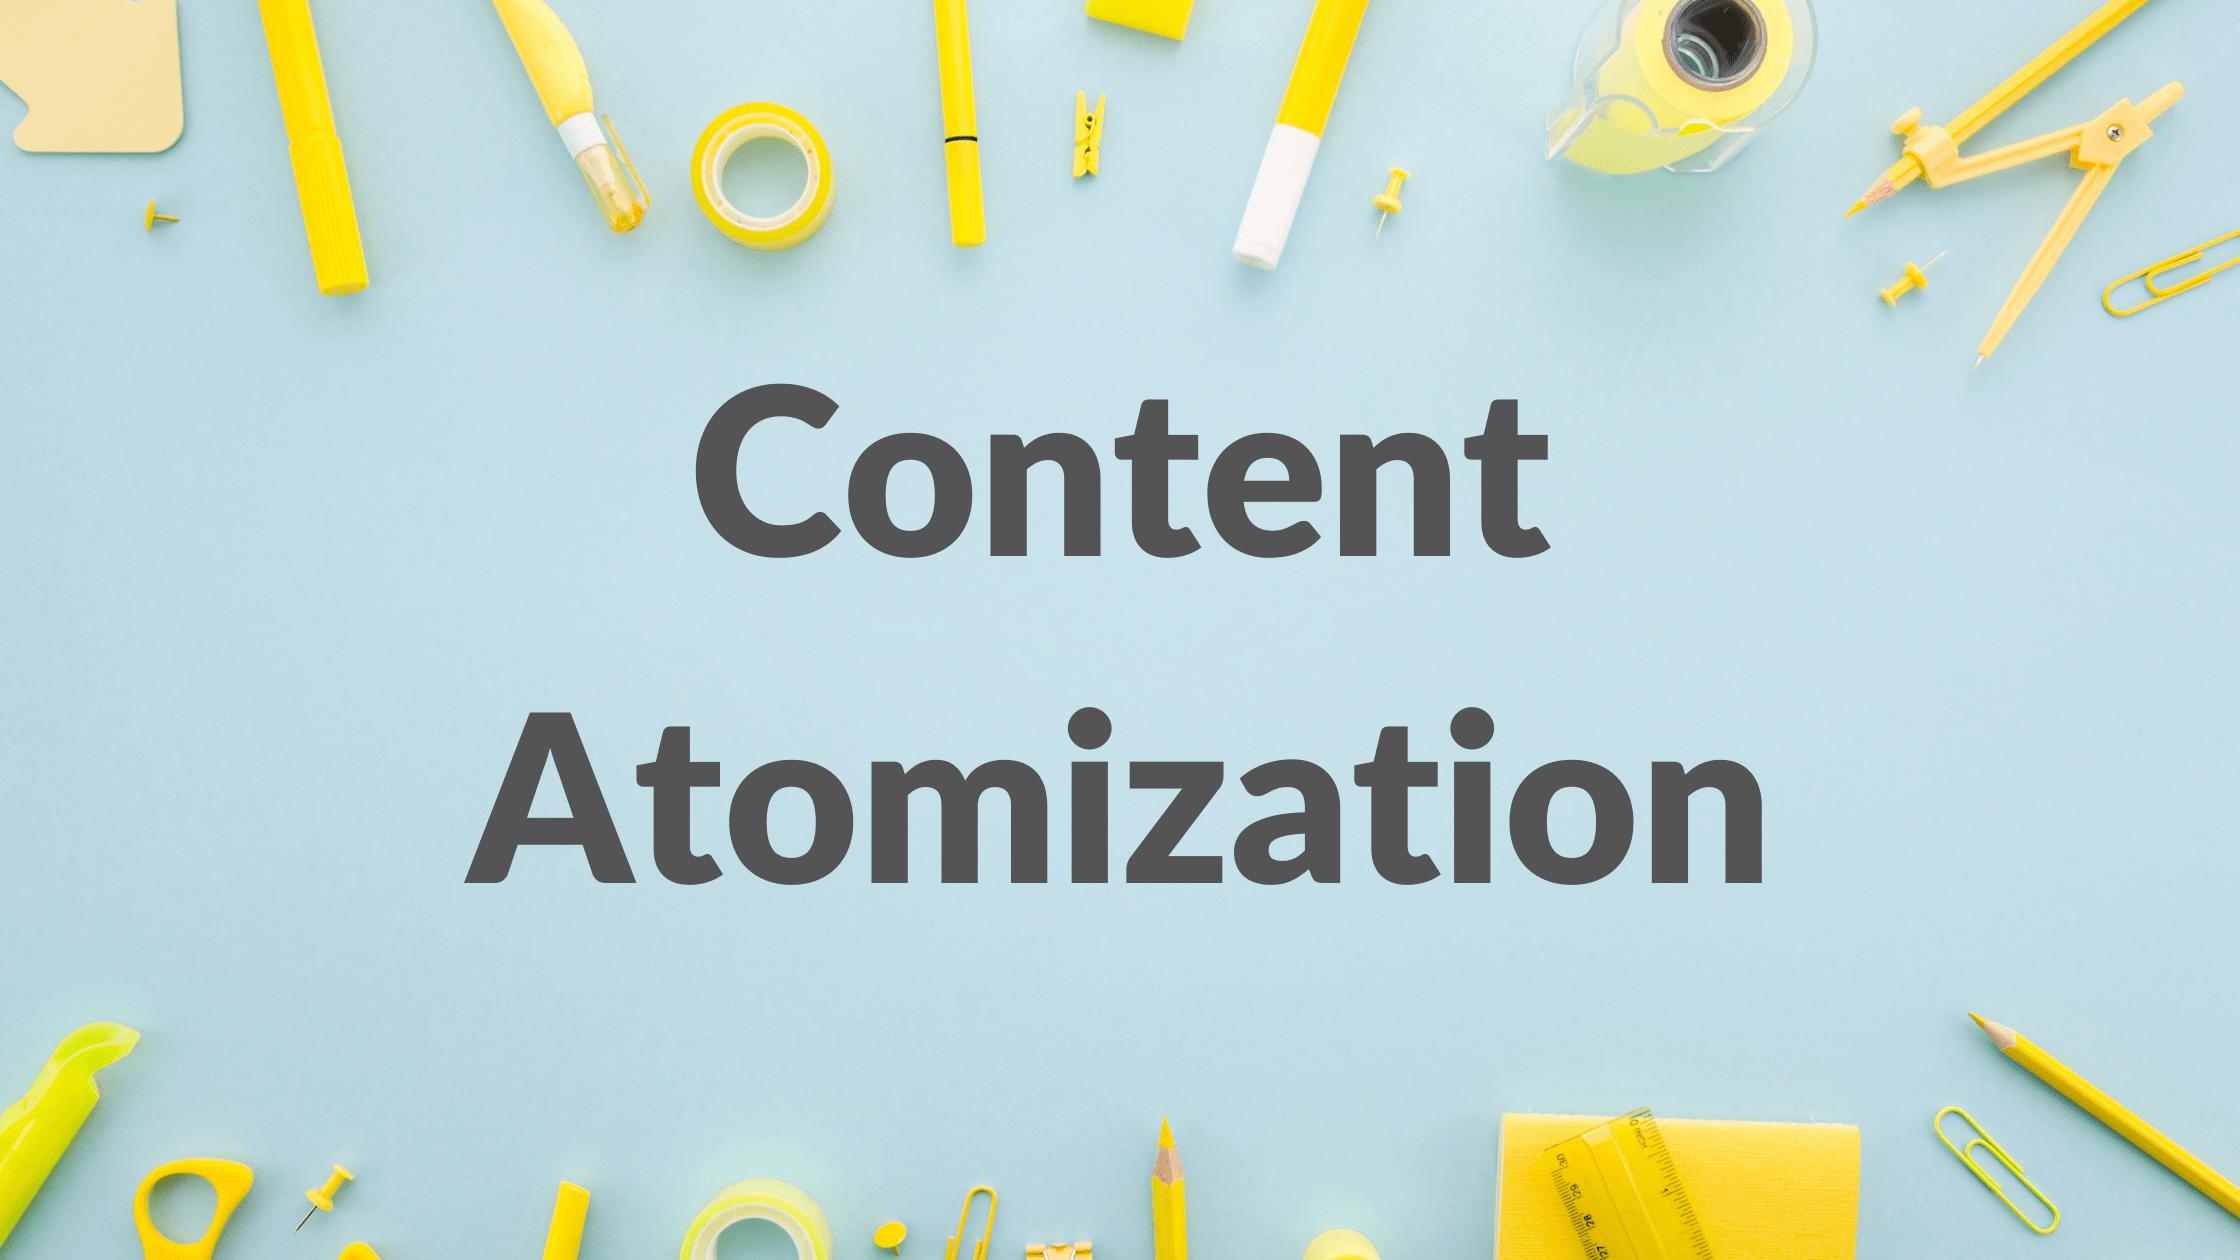 Content Atomization